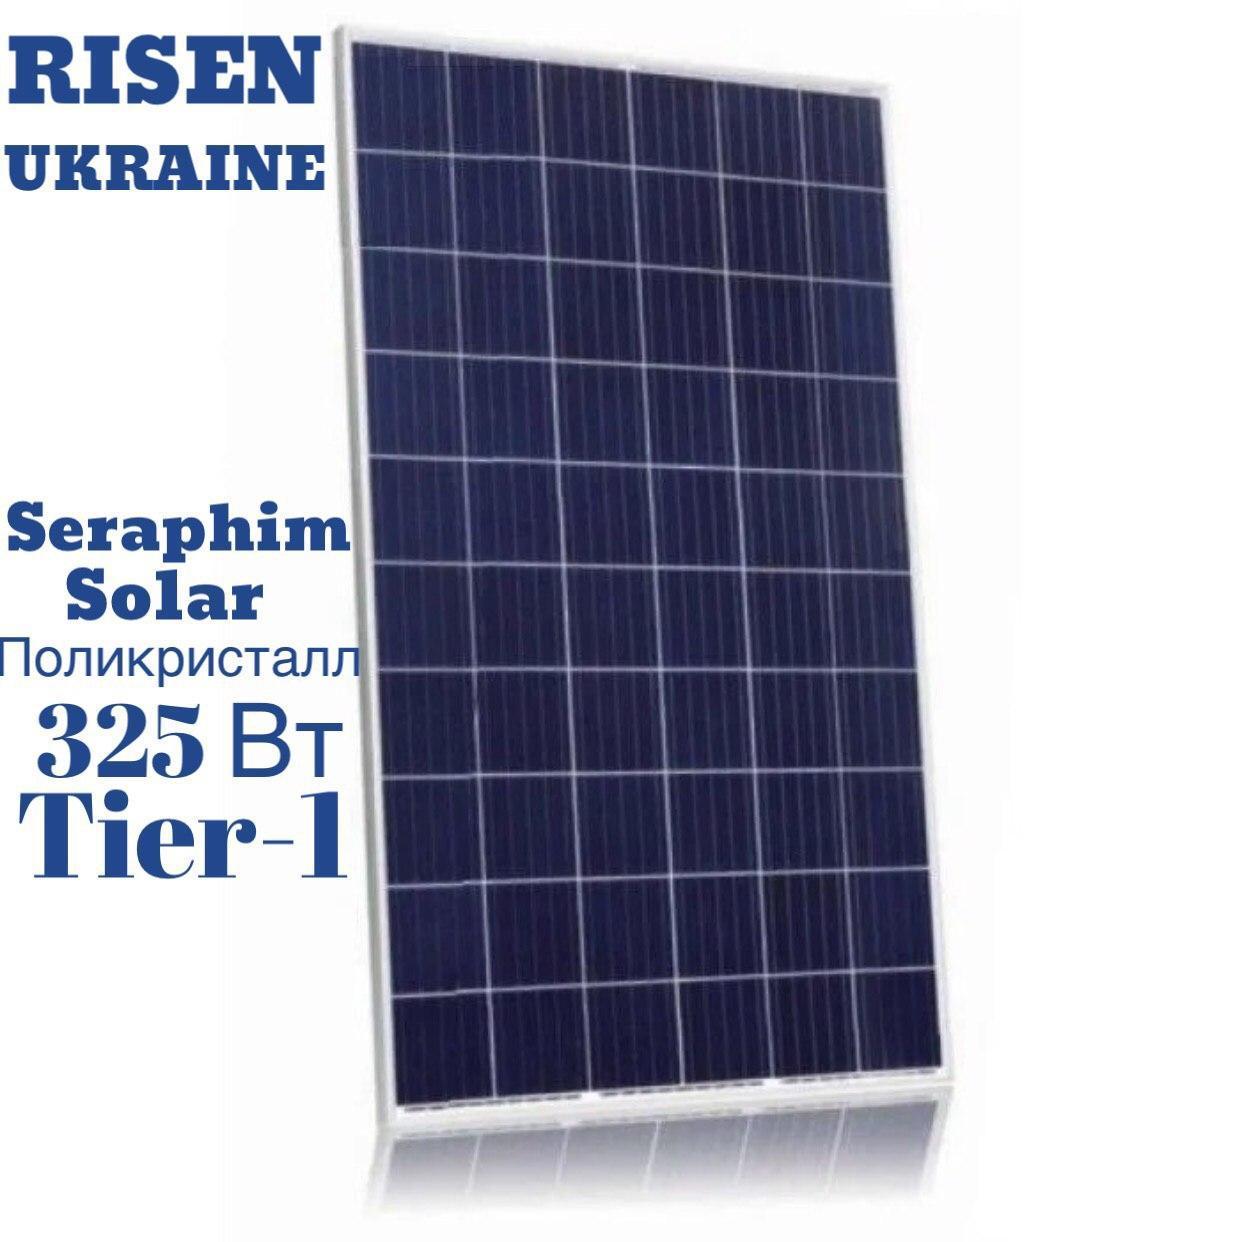 Сонячна батарея (полікристал) Seraphim Solar 325W Tier-1